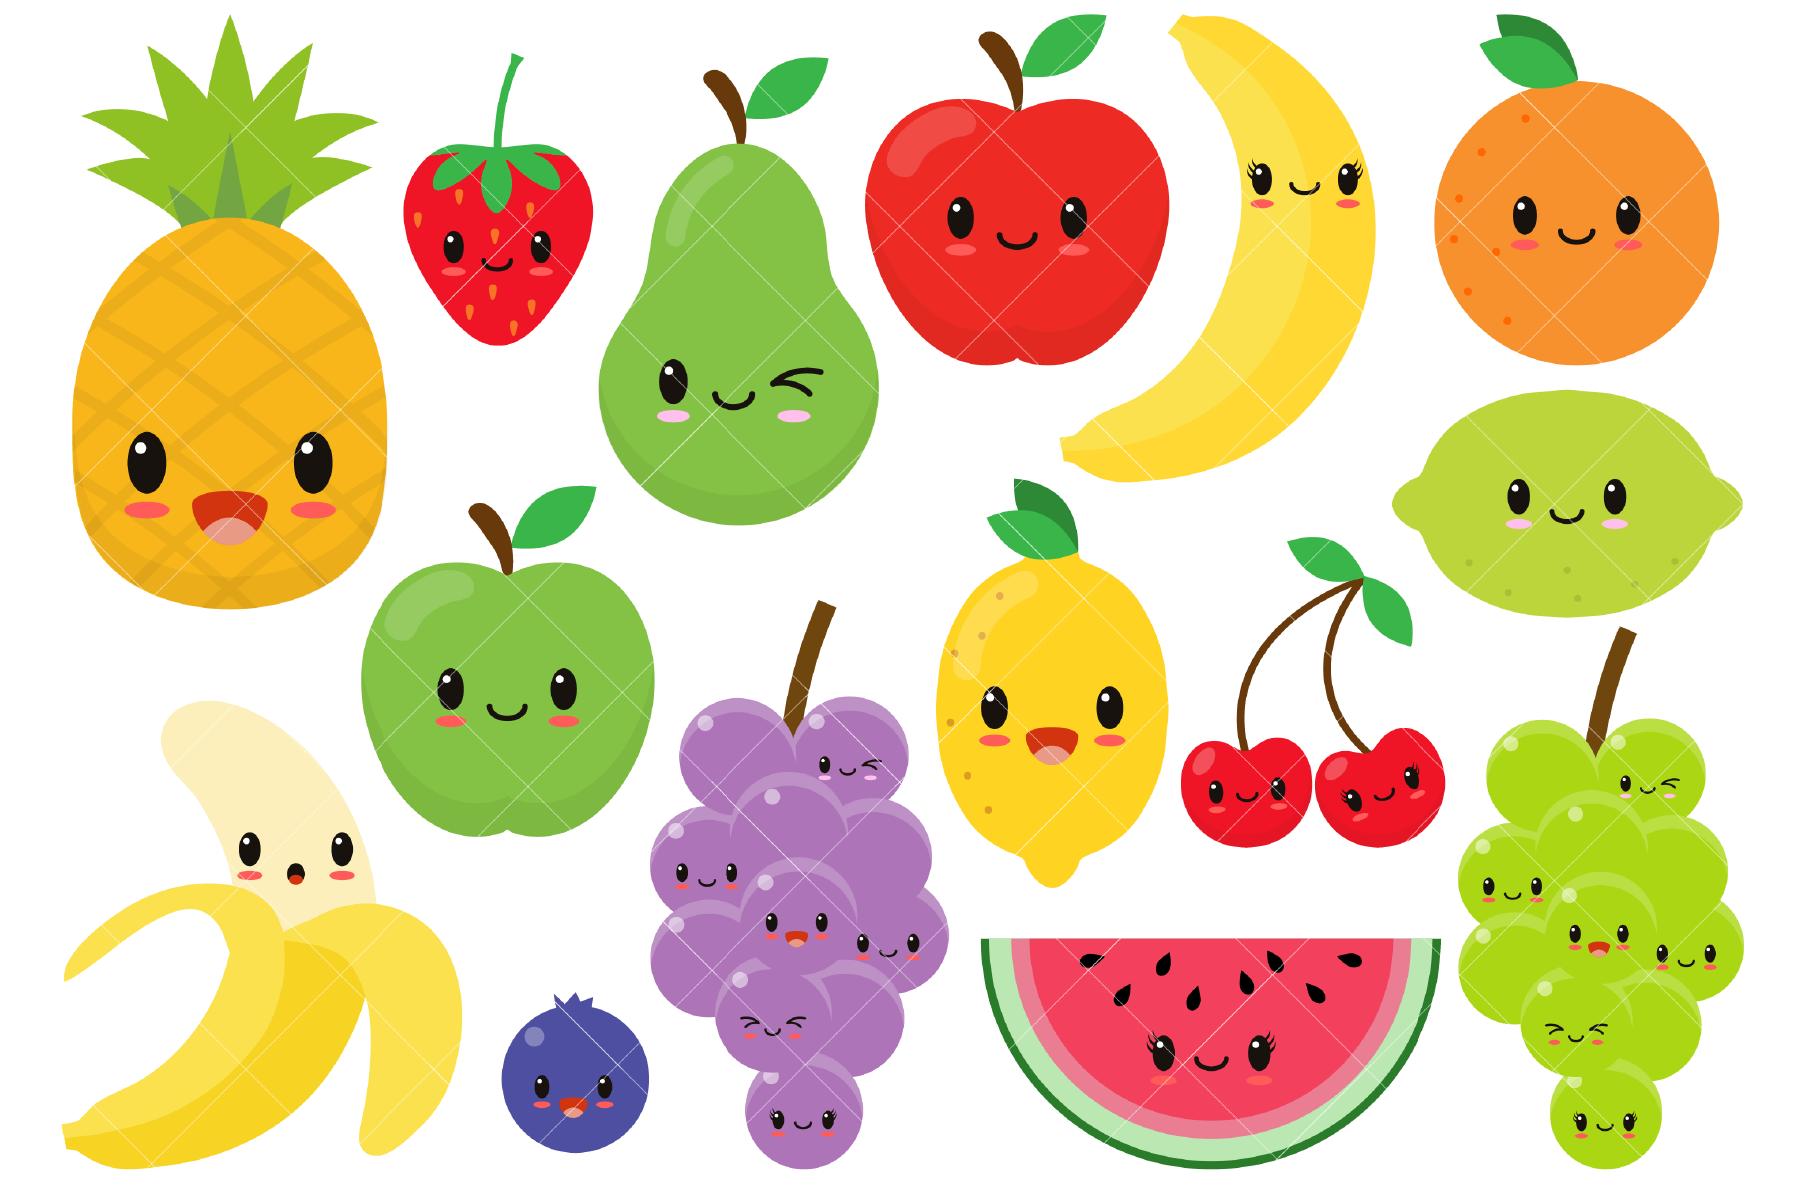 Different kinds of fresh fruits illustration.